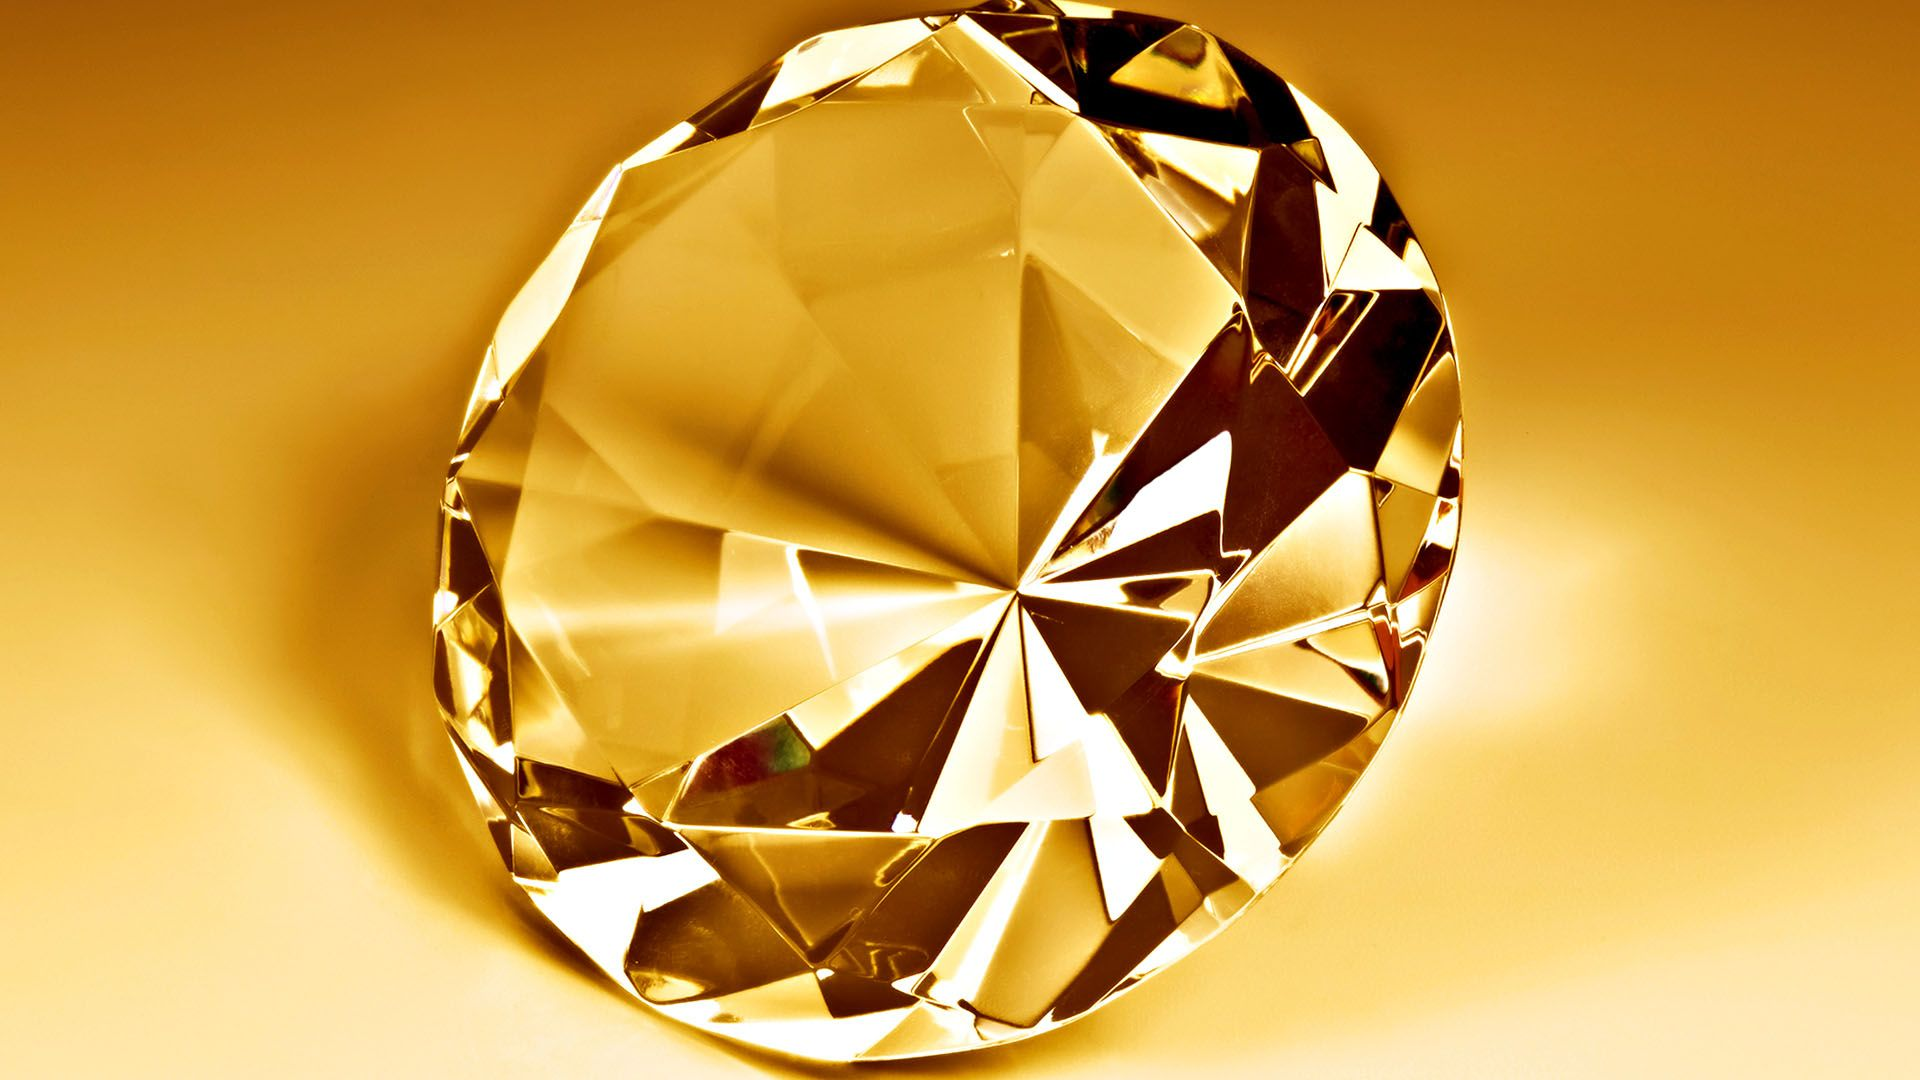 3D Diamond Gold Wallpapers HD